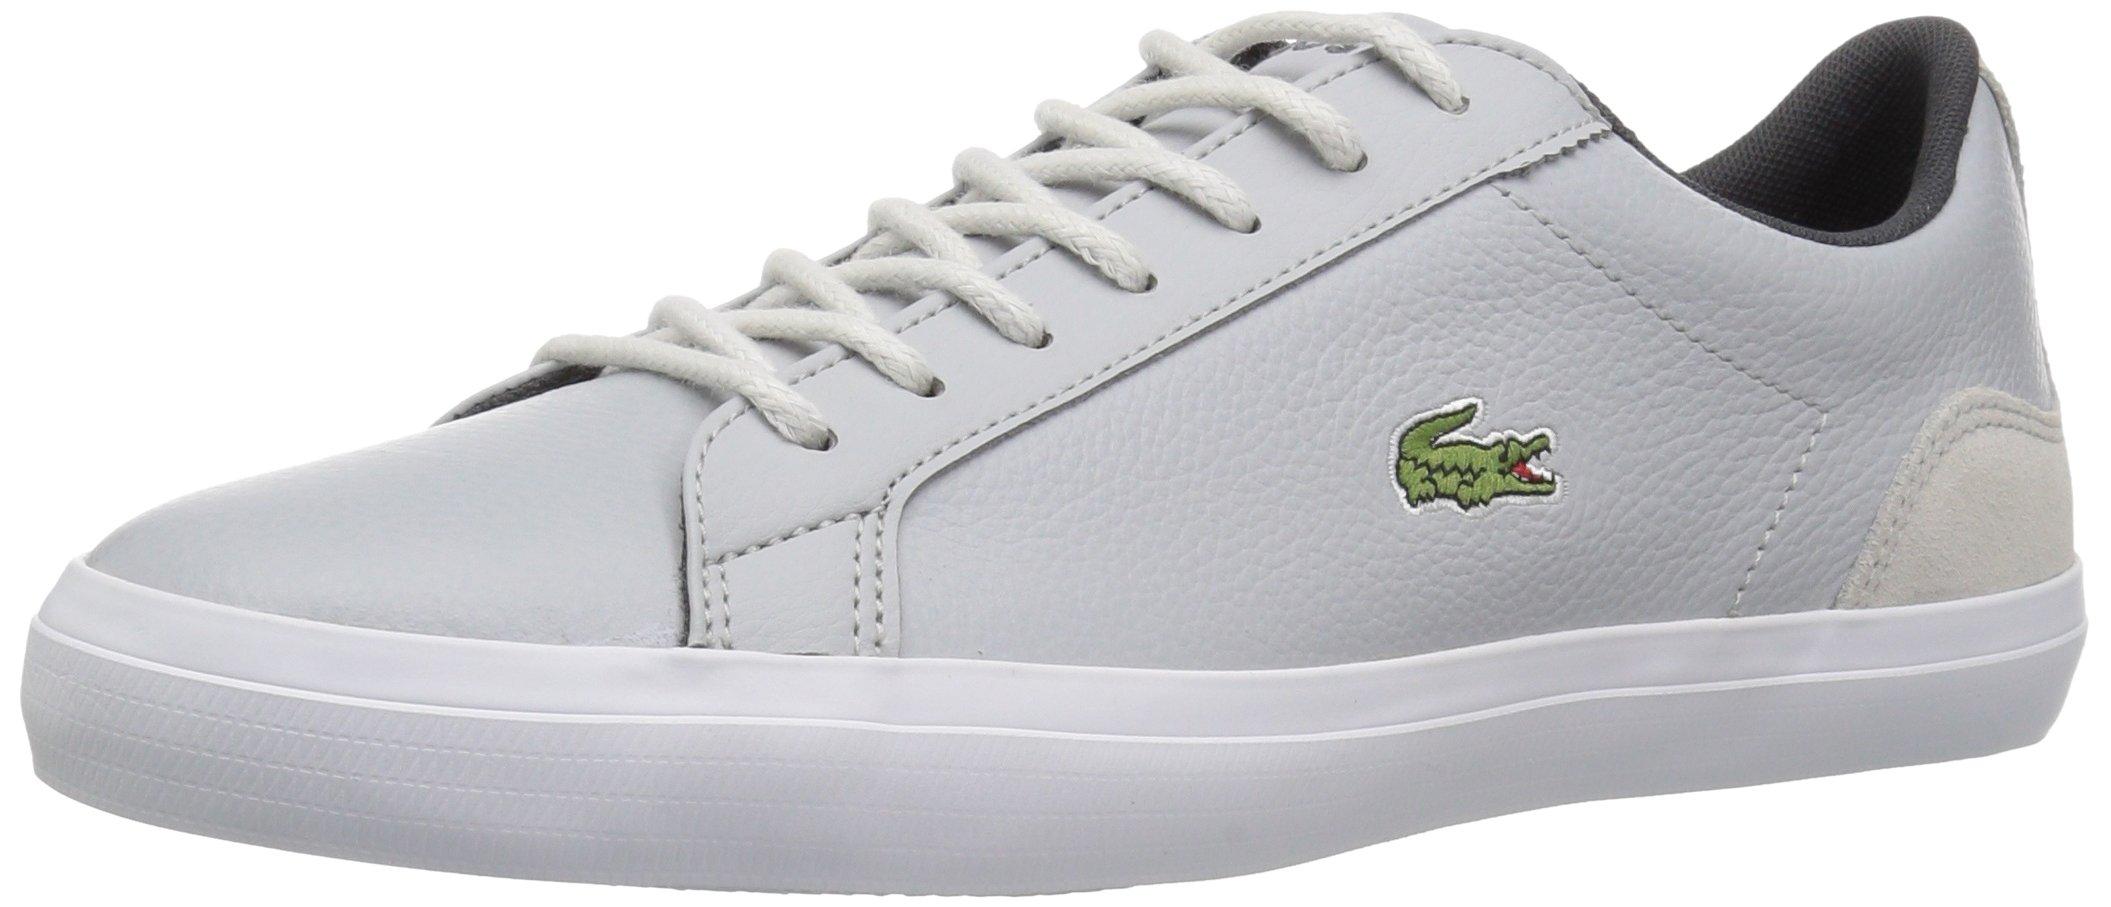 da9ec4aa5975ec Galleon - Lacoste Men s Lerond Sneaker